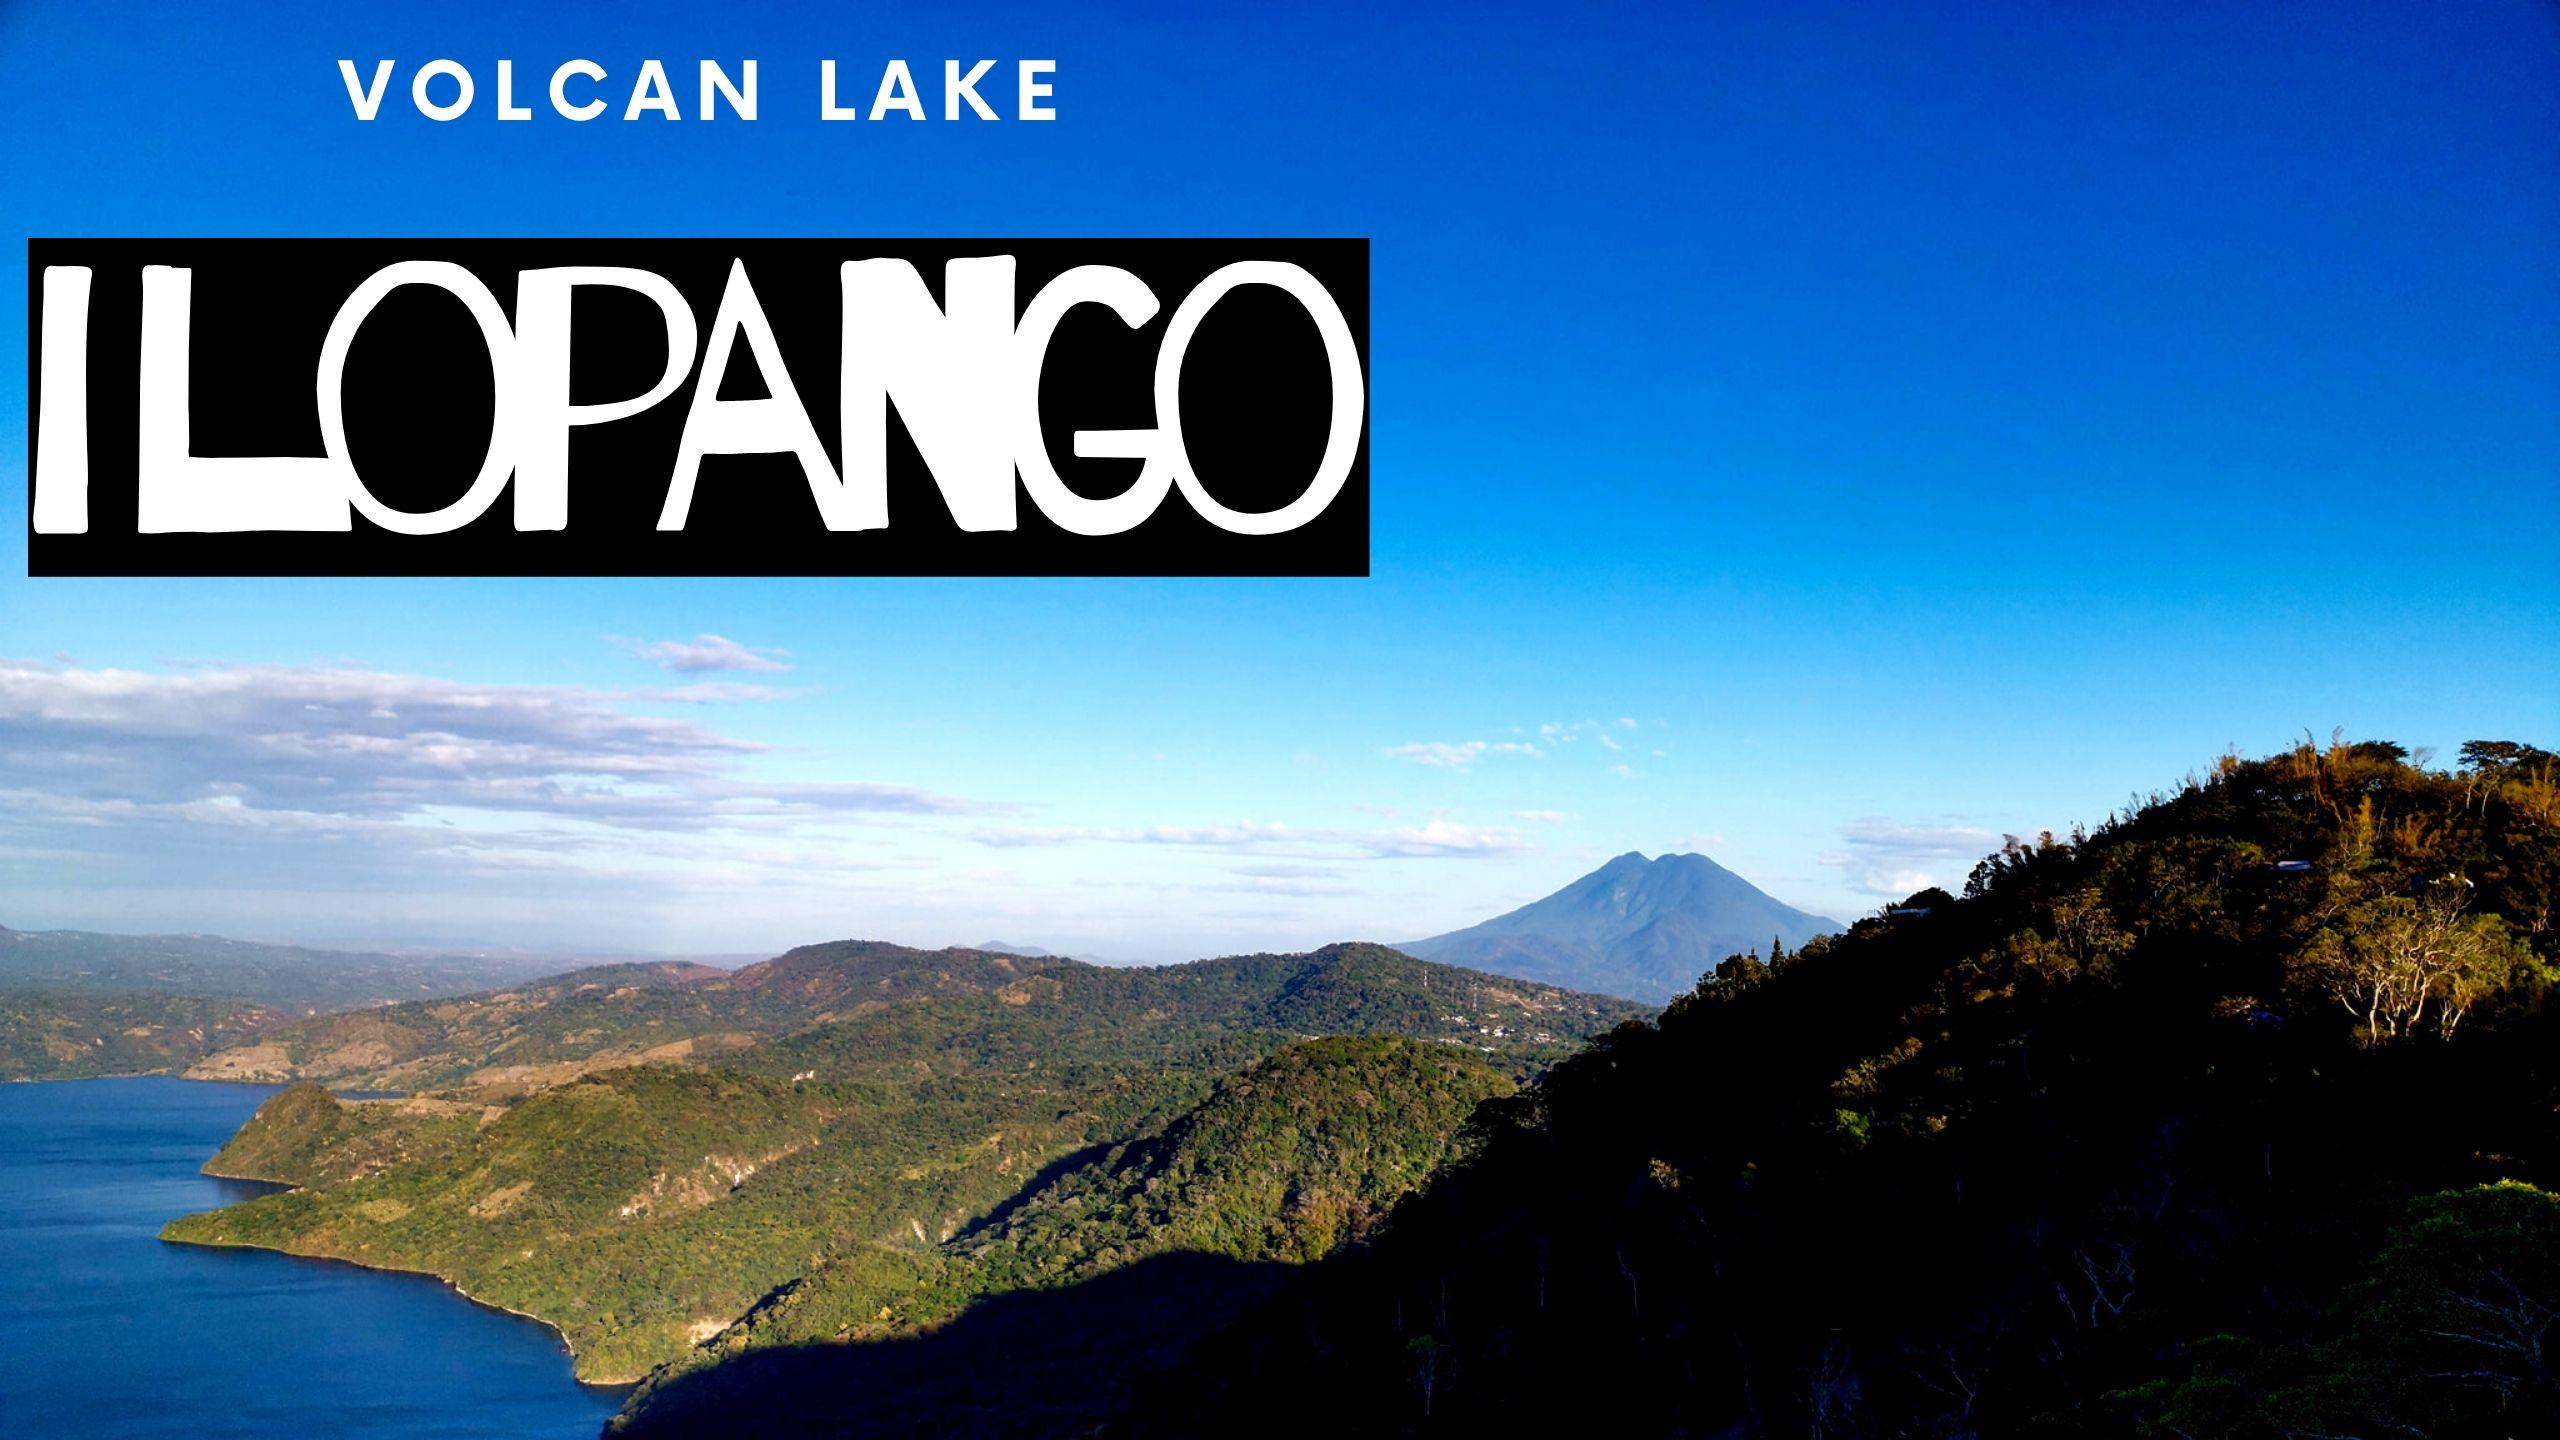 Volcan Ilopango Lake